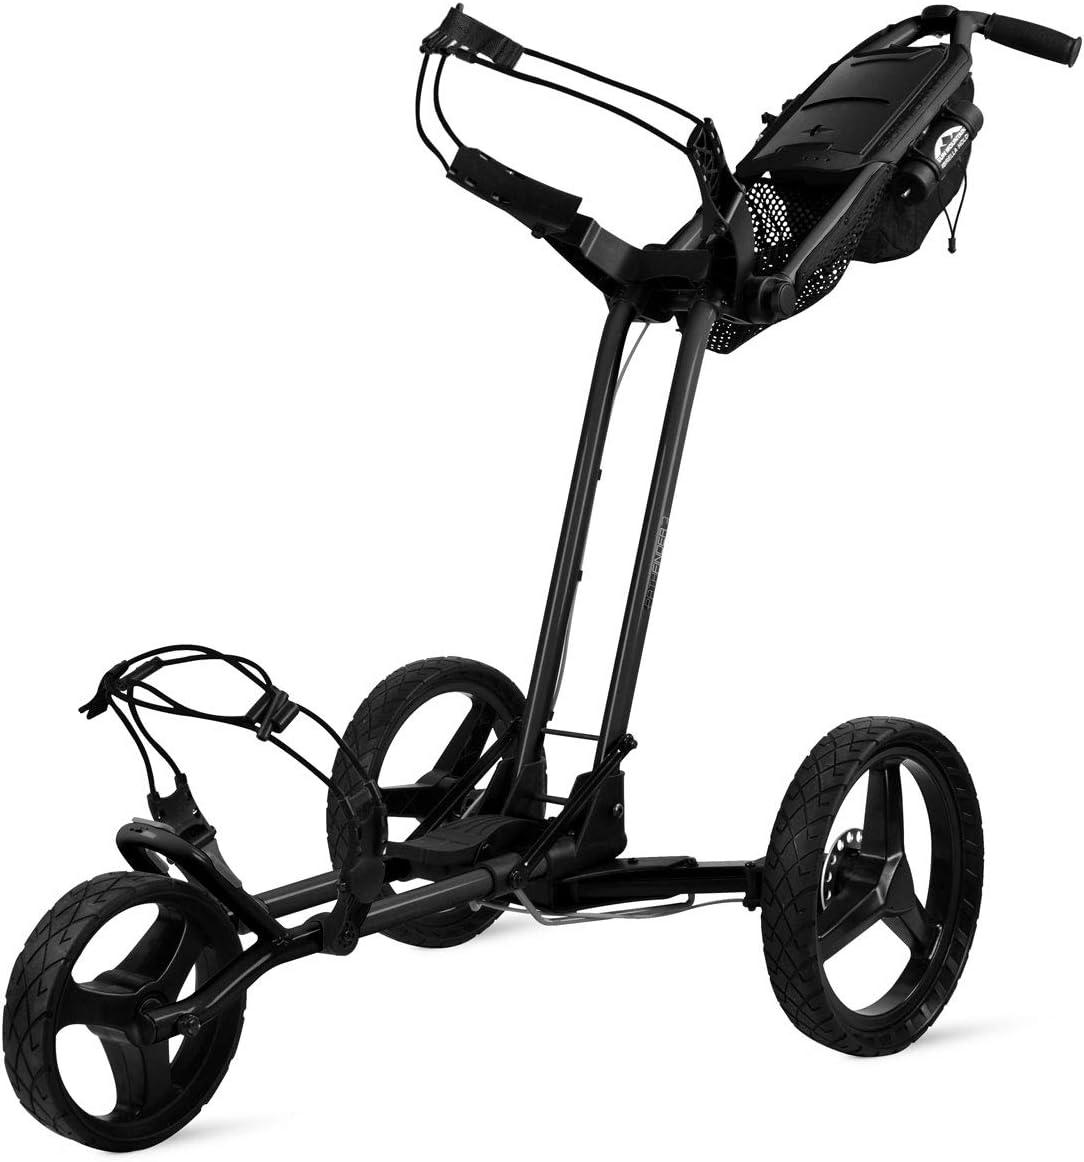 Sun Mountain Golf 2019 Pathfinder 3 Push Cart BLACK (Black, )